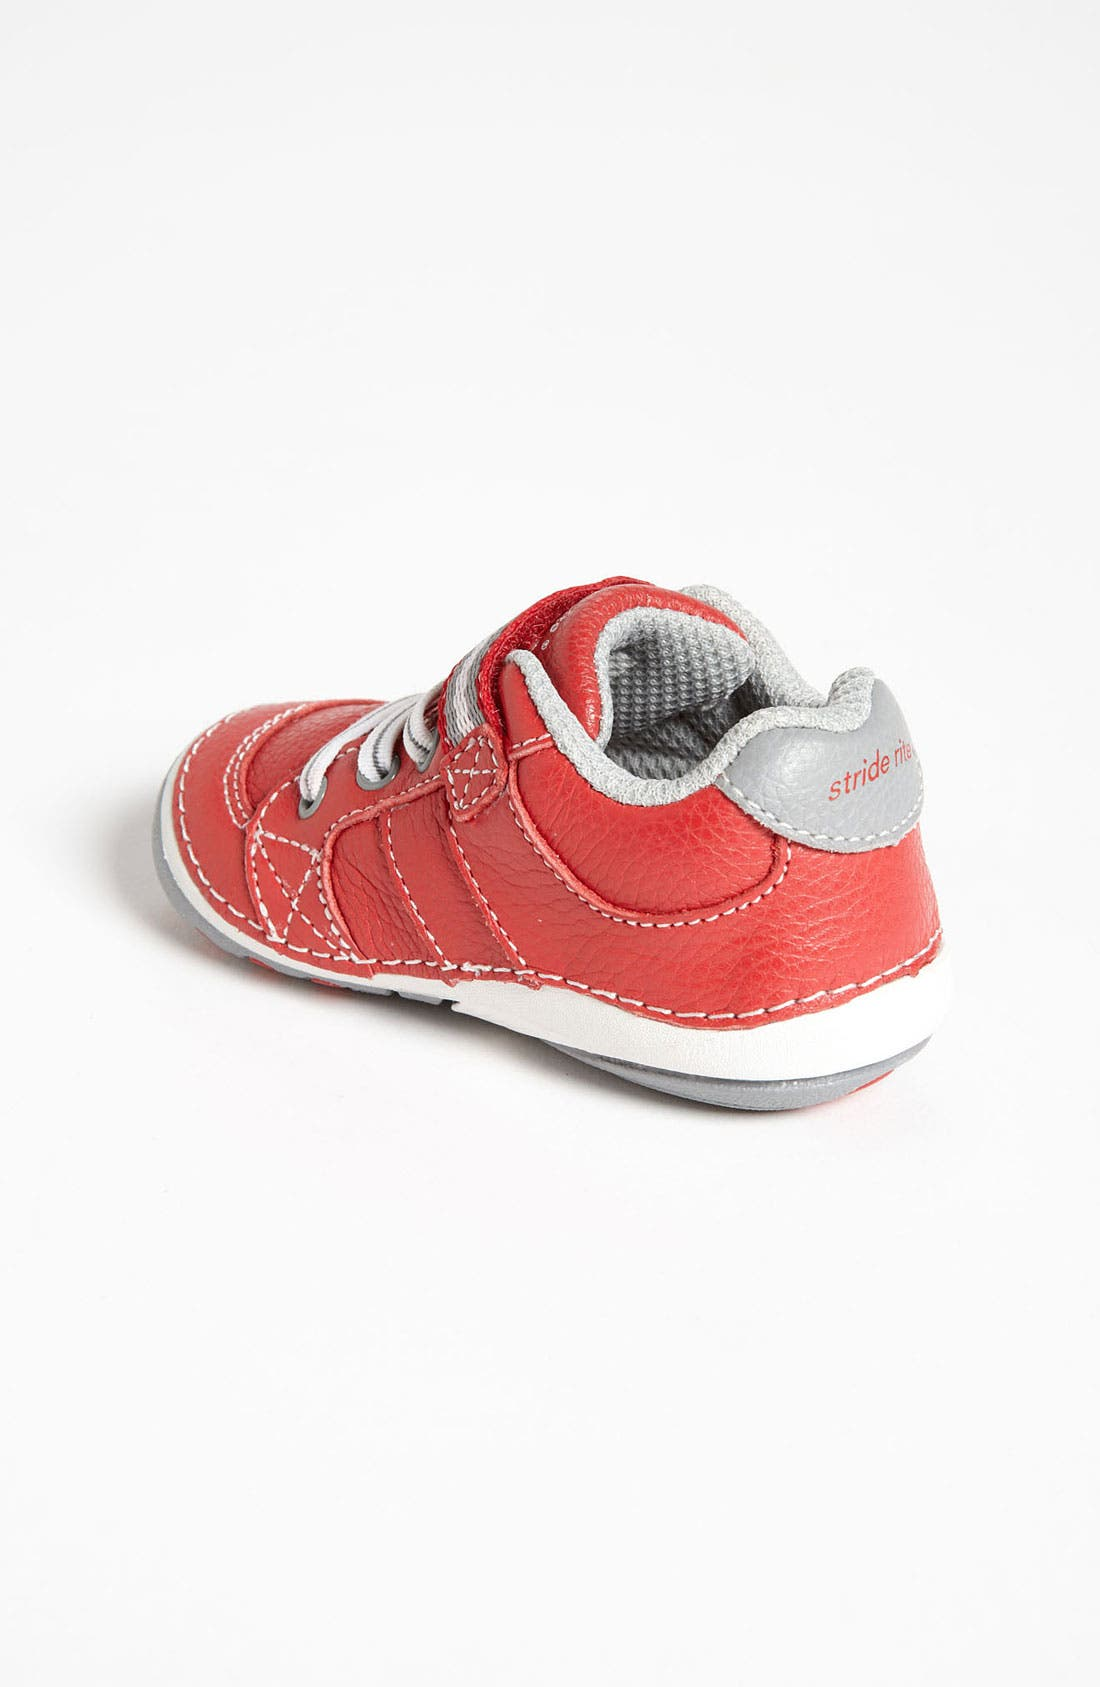 'Artie' Sneaker,                             Alternate thumbnail 2, color,                             Red/ Grey